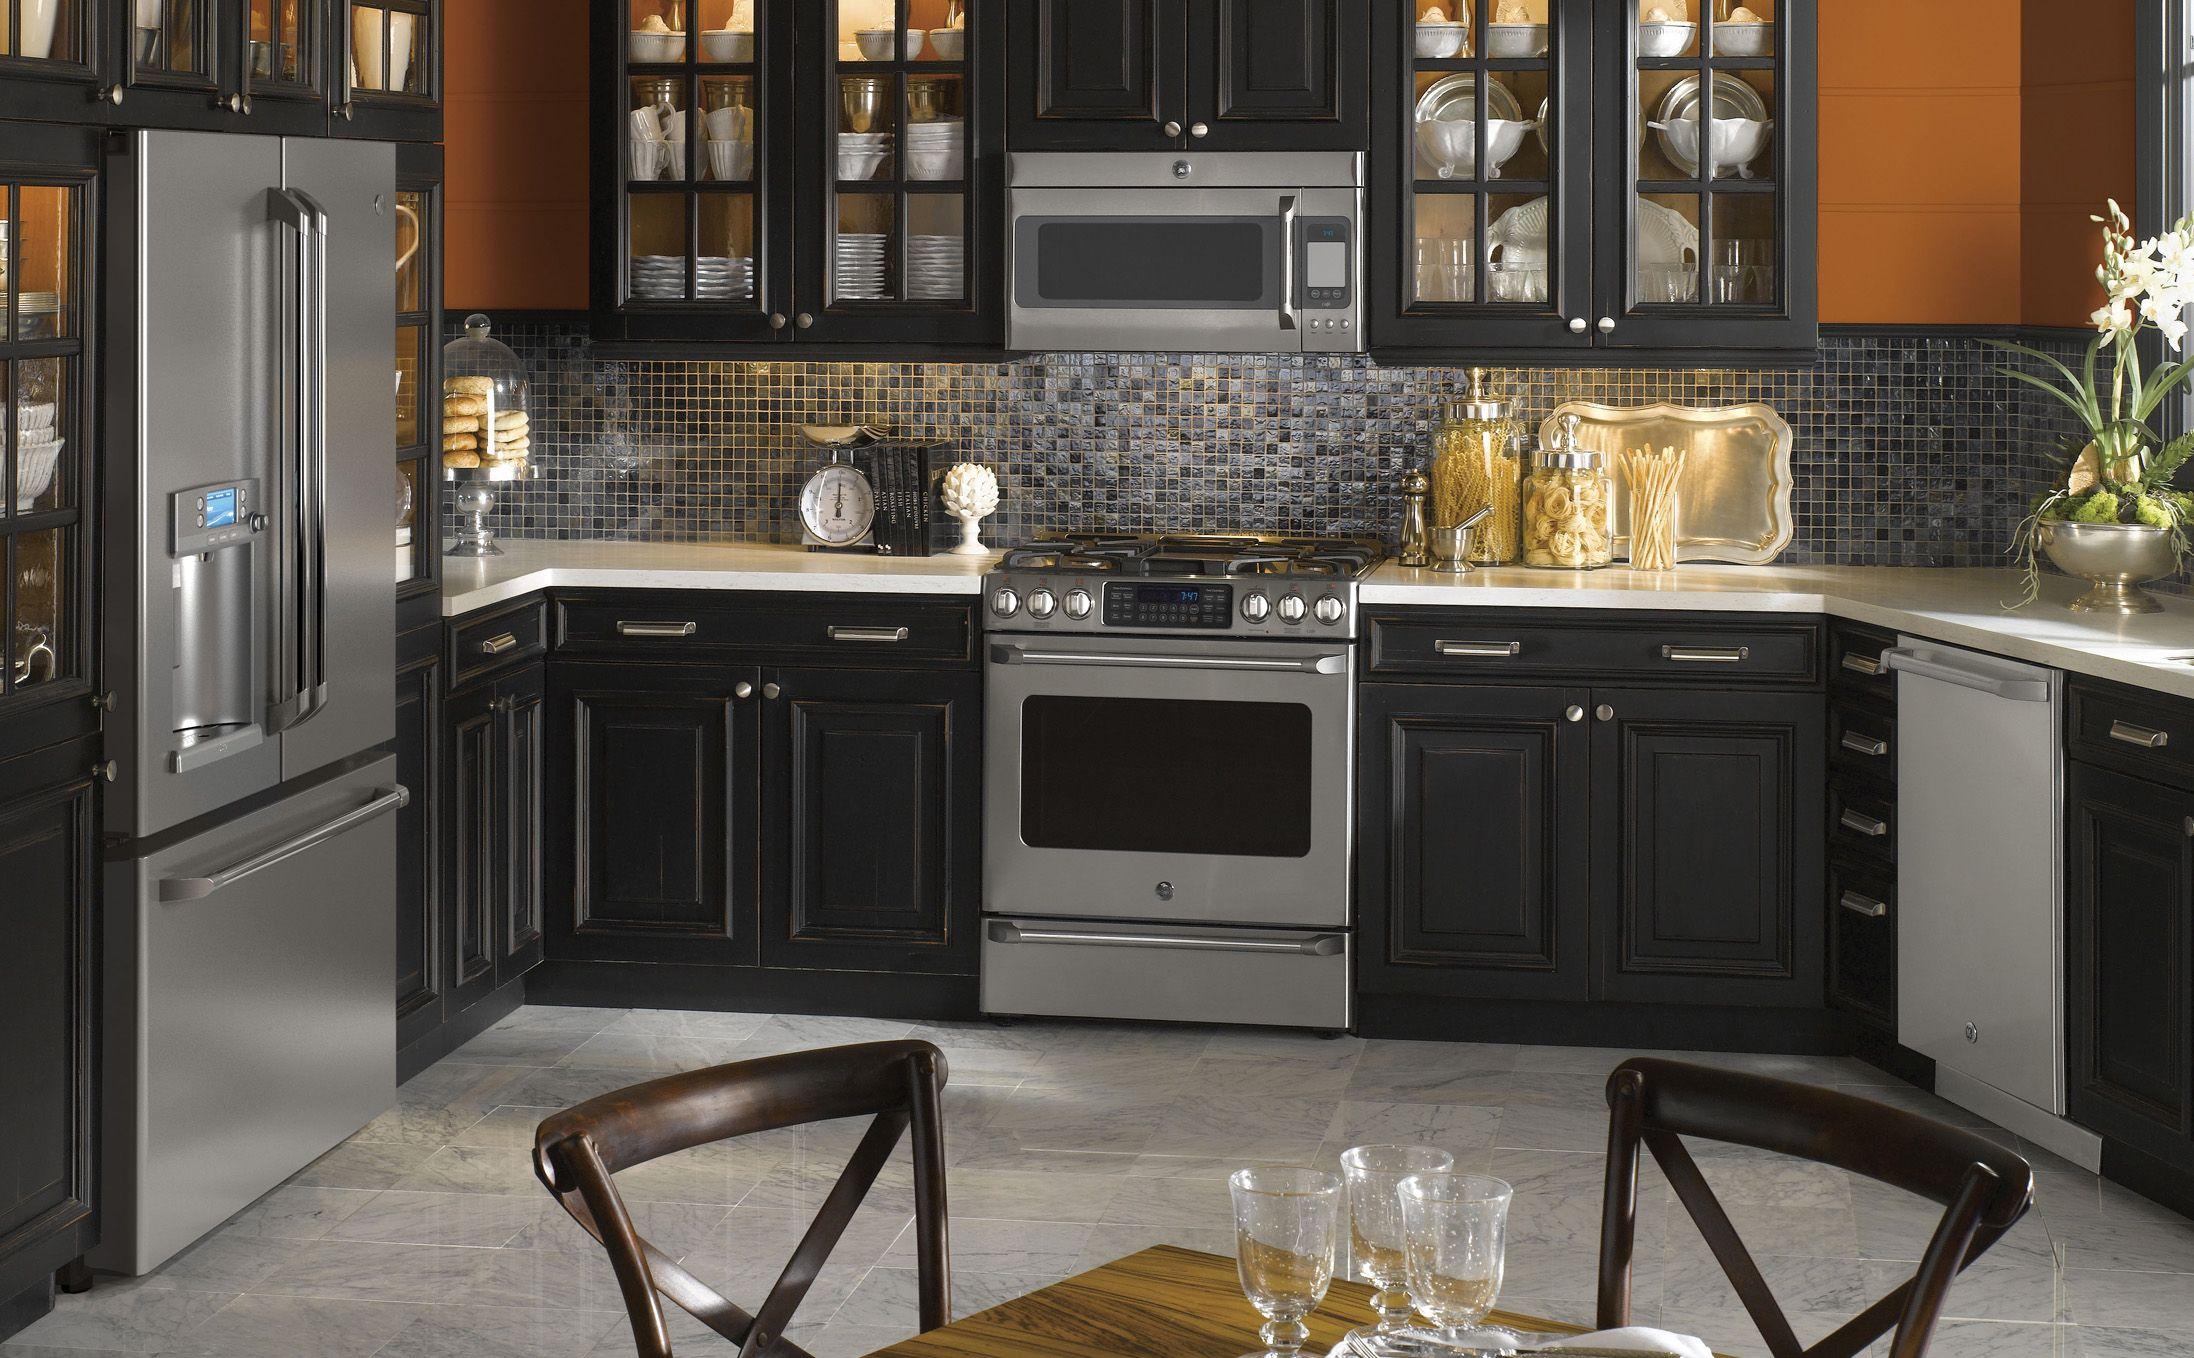 36 gorgeous black kitchen cabinet design ideas you will love blackkitchencabinet on kitchen remodel appliances id=80209